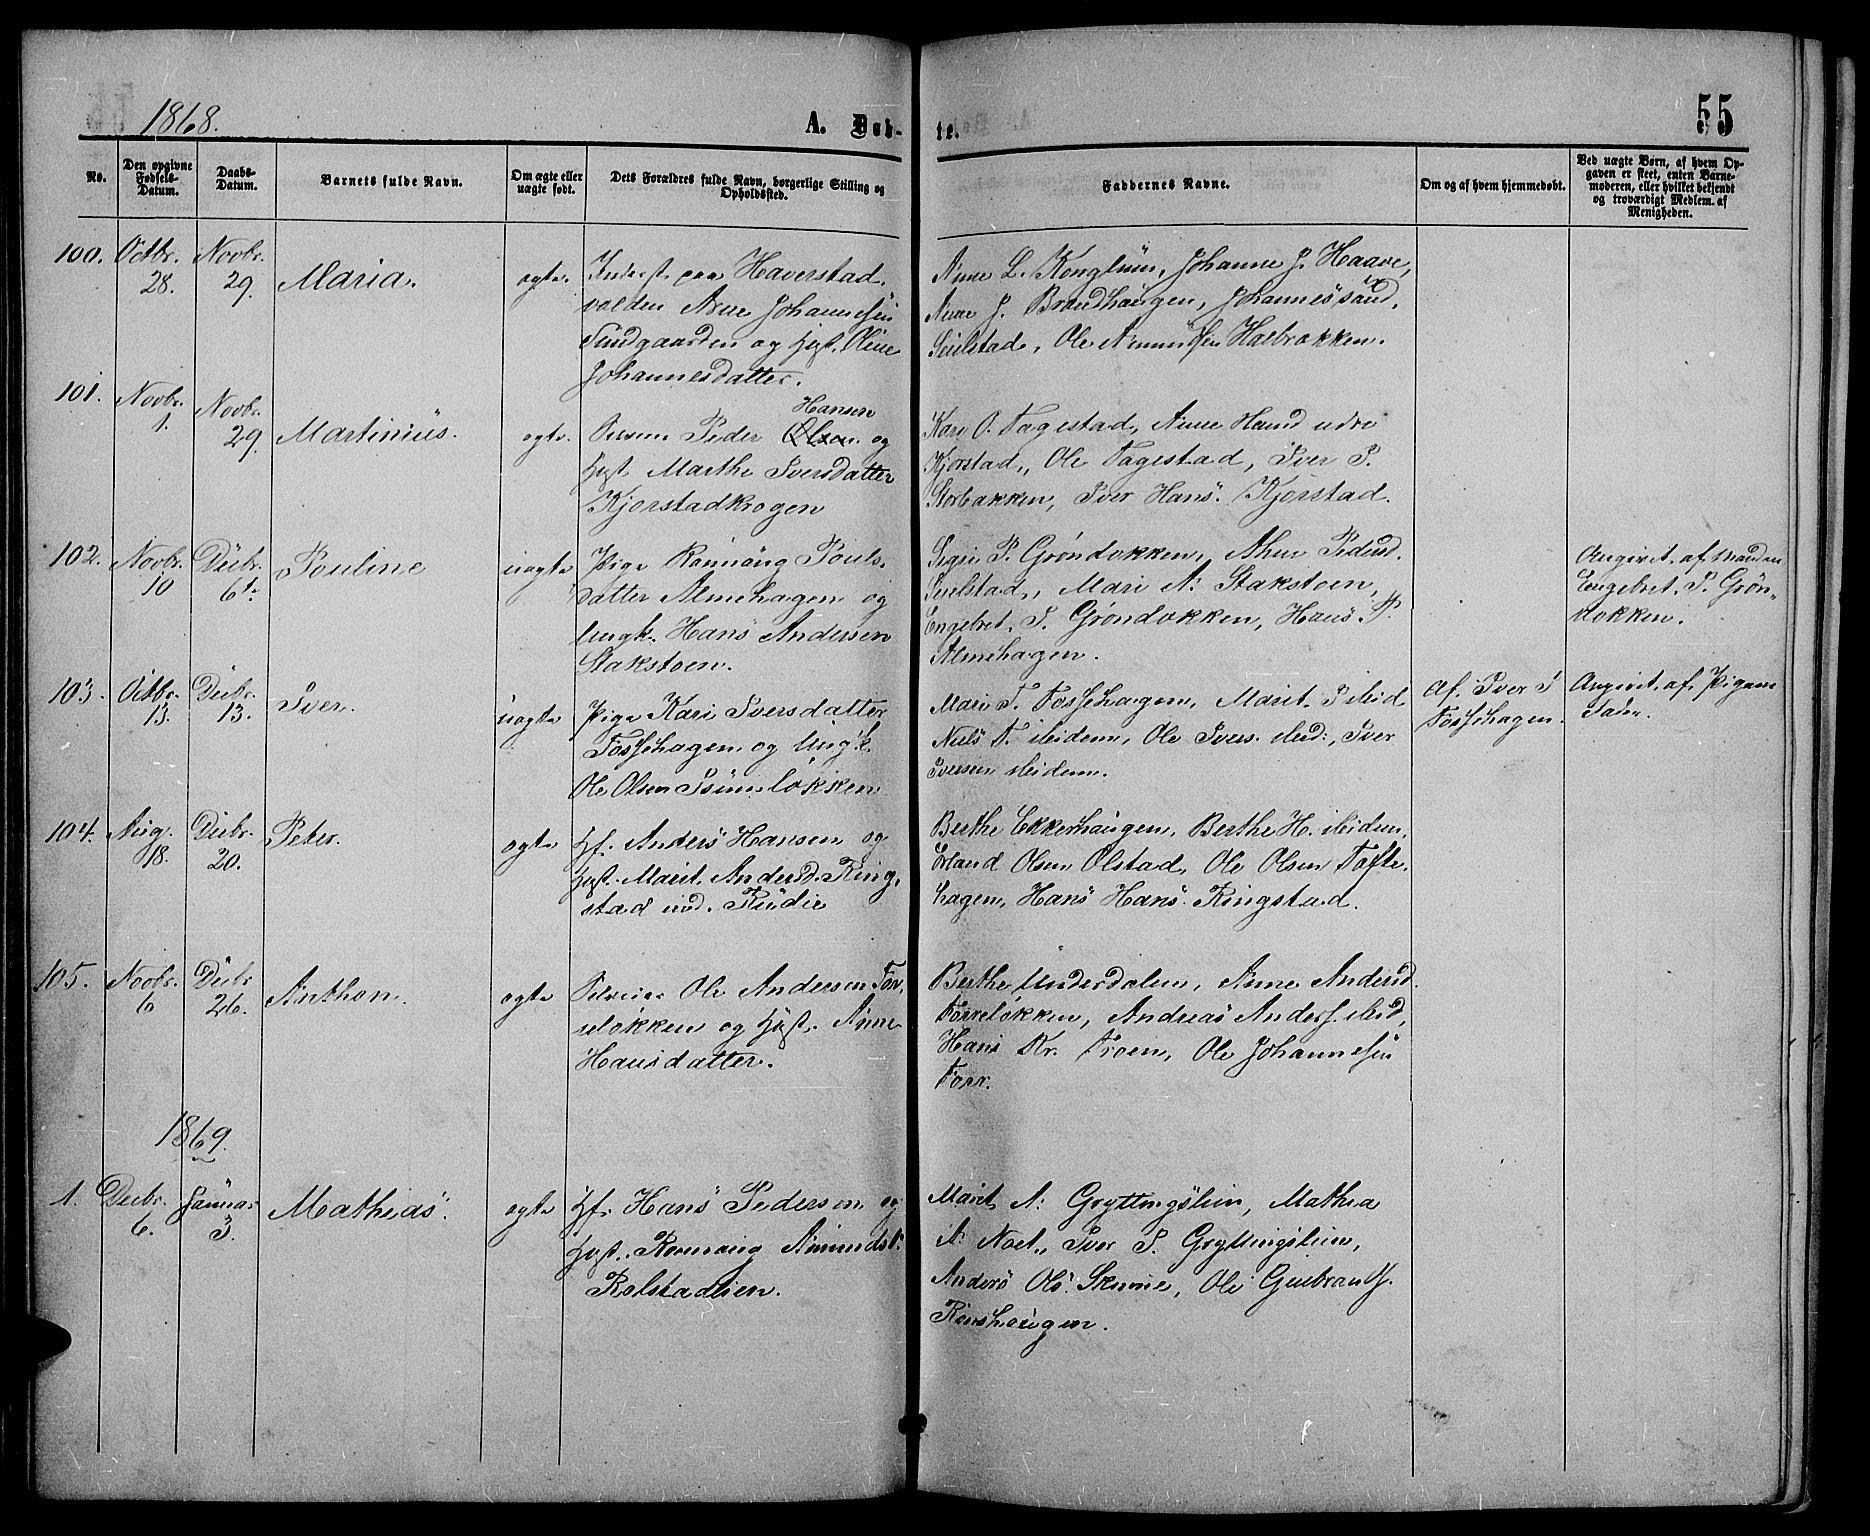 SAH, Sør-Fron prestekontor, H/Ha/Hab/L0002: Klokkerbok nr. 2, 1864-1883, s. 55